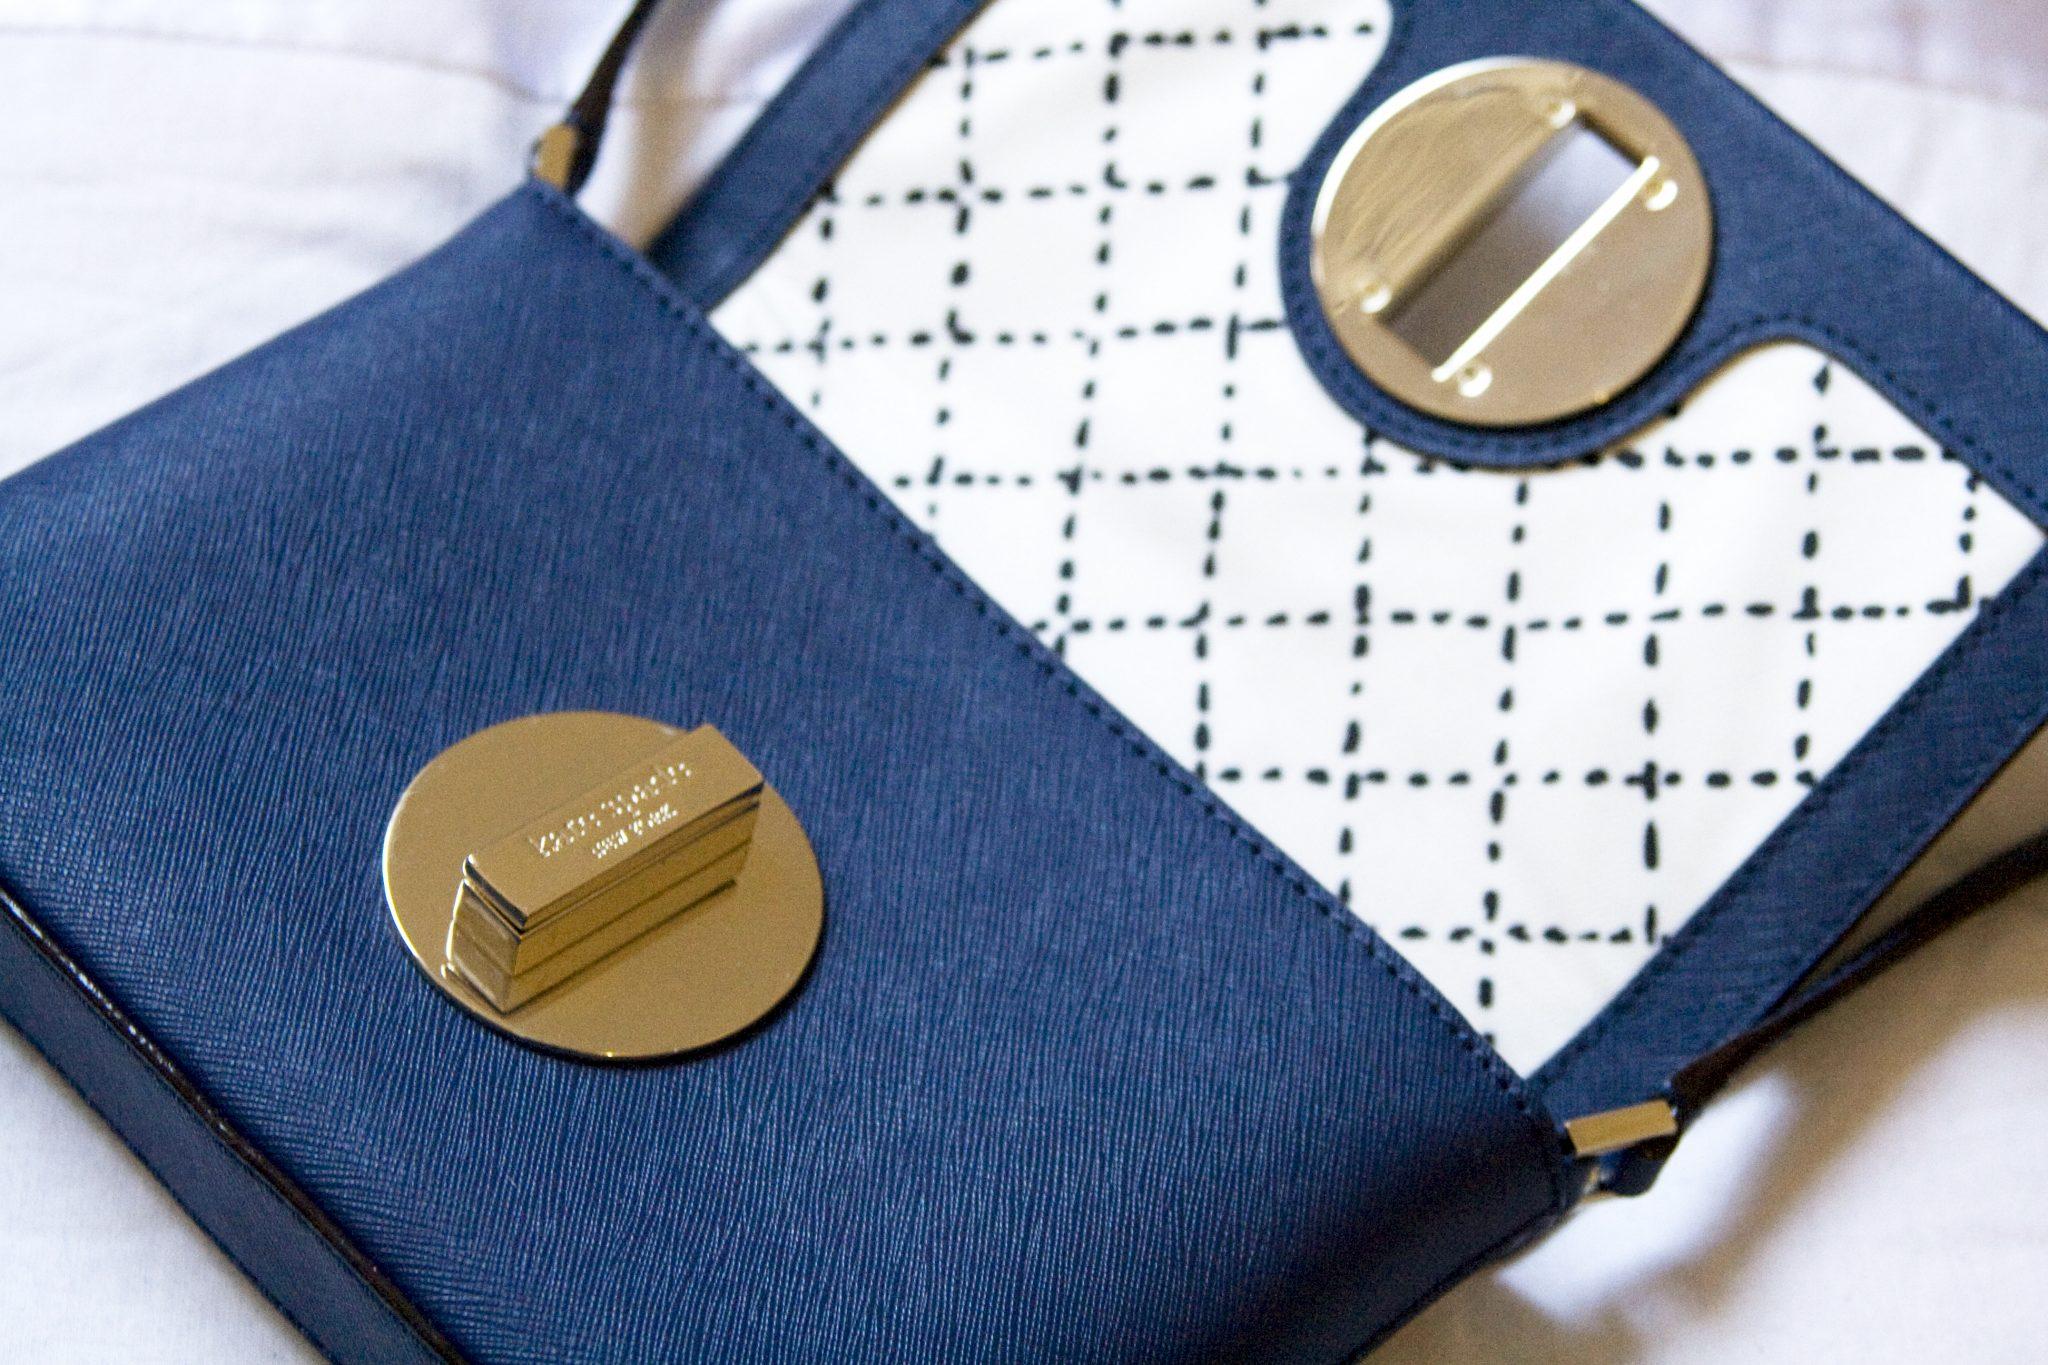 Kate Spade Sally Crossbody Handbag Purse Midnight Blue. Manchester based lifestyle and fashion blogger. Orlando, Florida.